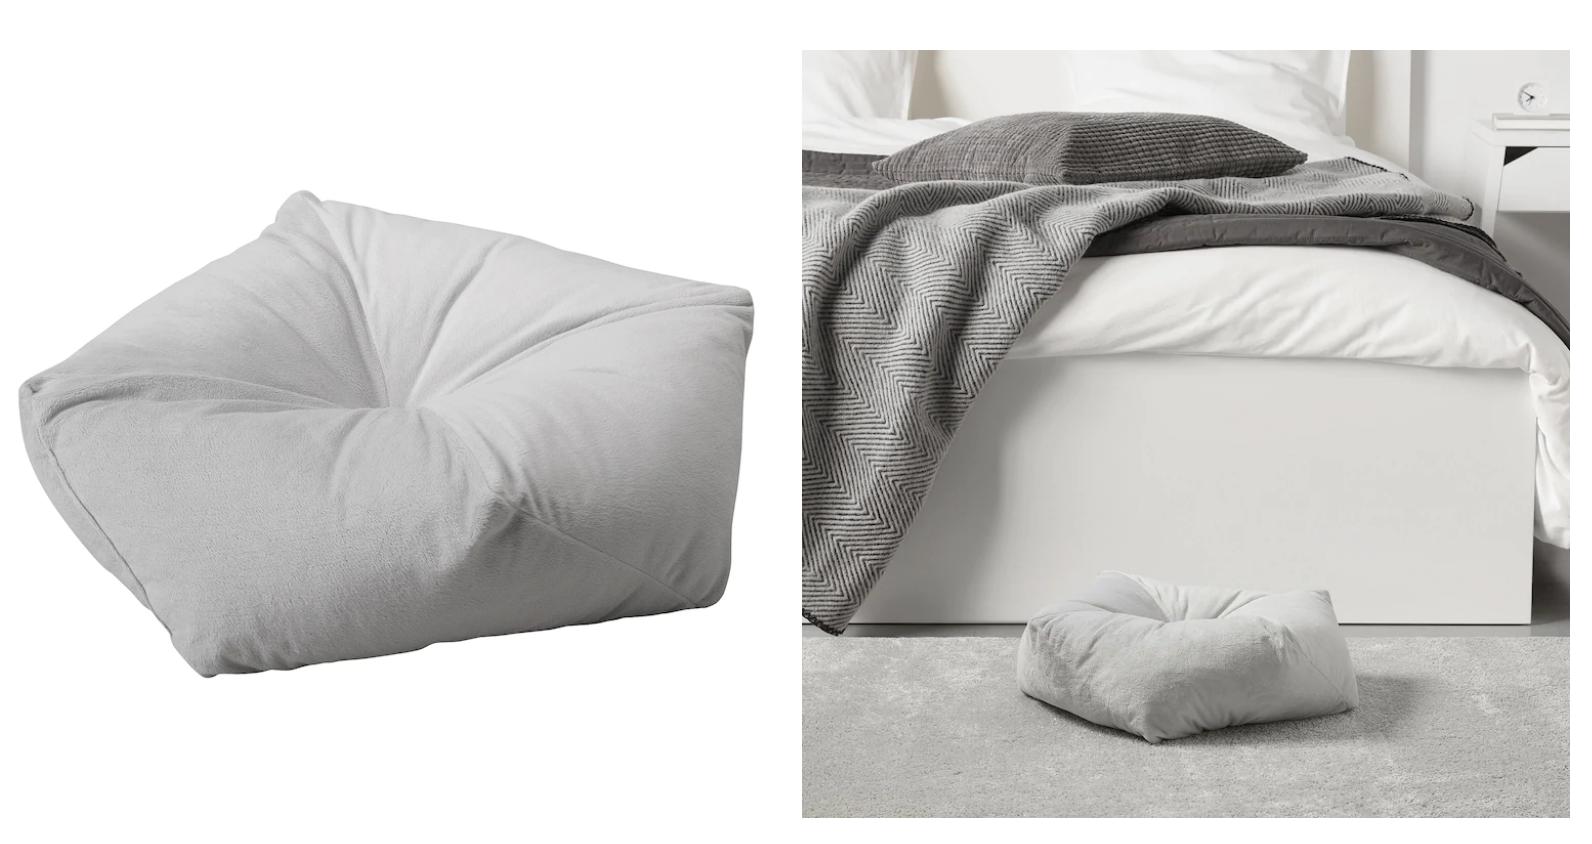 Подушка для питомца LURVIG ЛУРВИГ, скриншот с сайта IKEA.ru